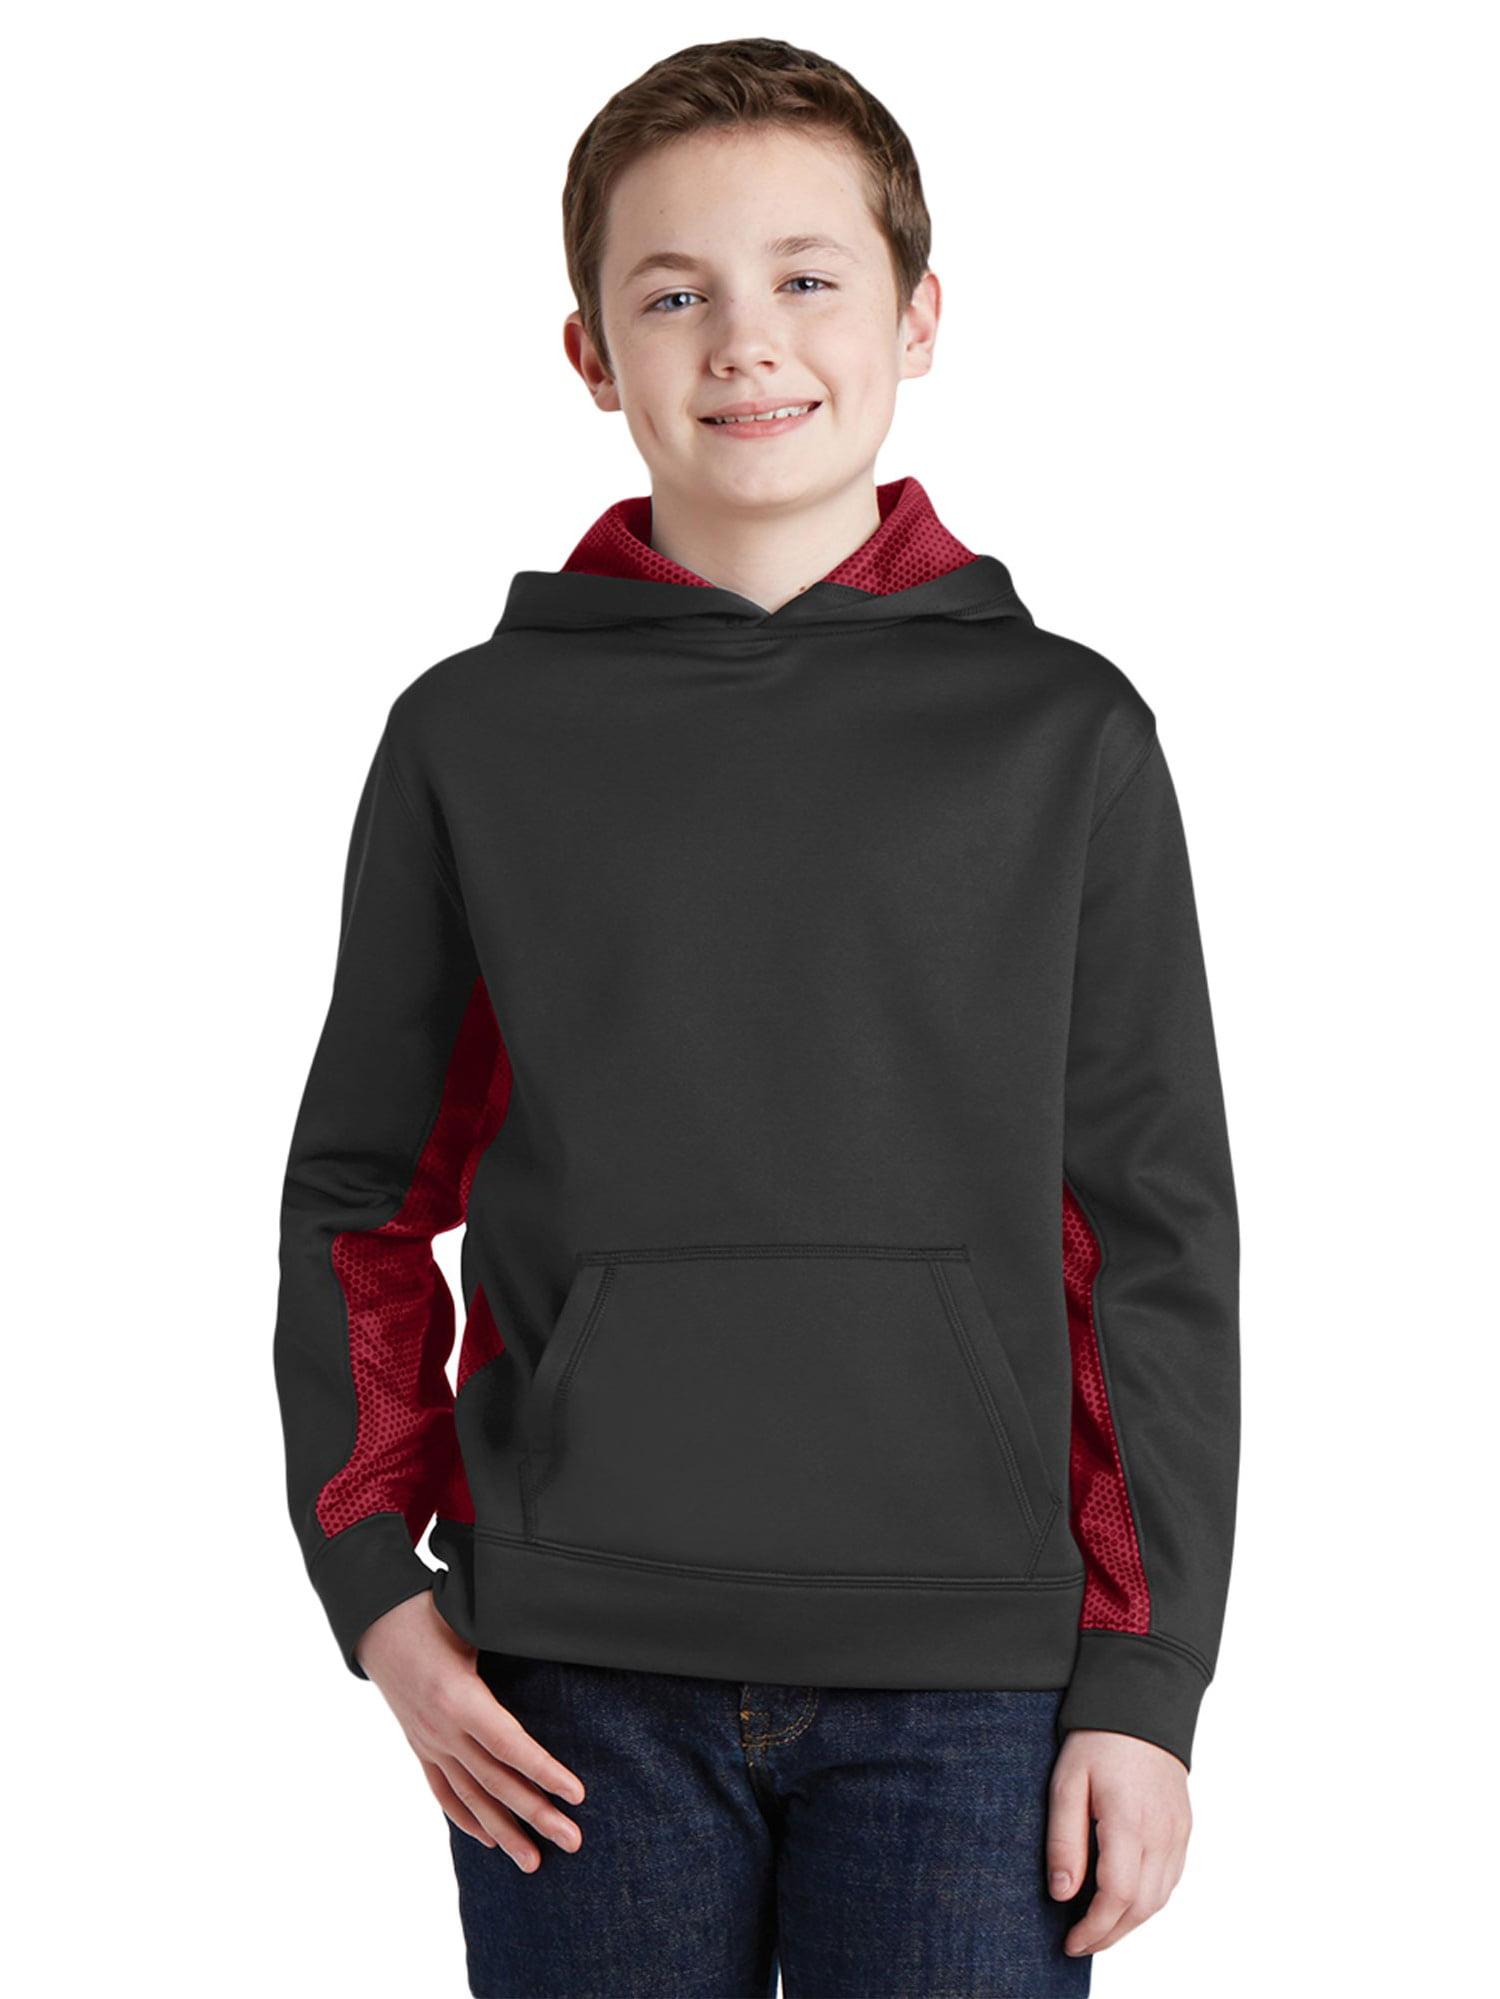 Sport-Tek Boy's CamoHex Hooded Pullover